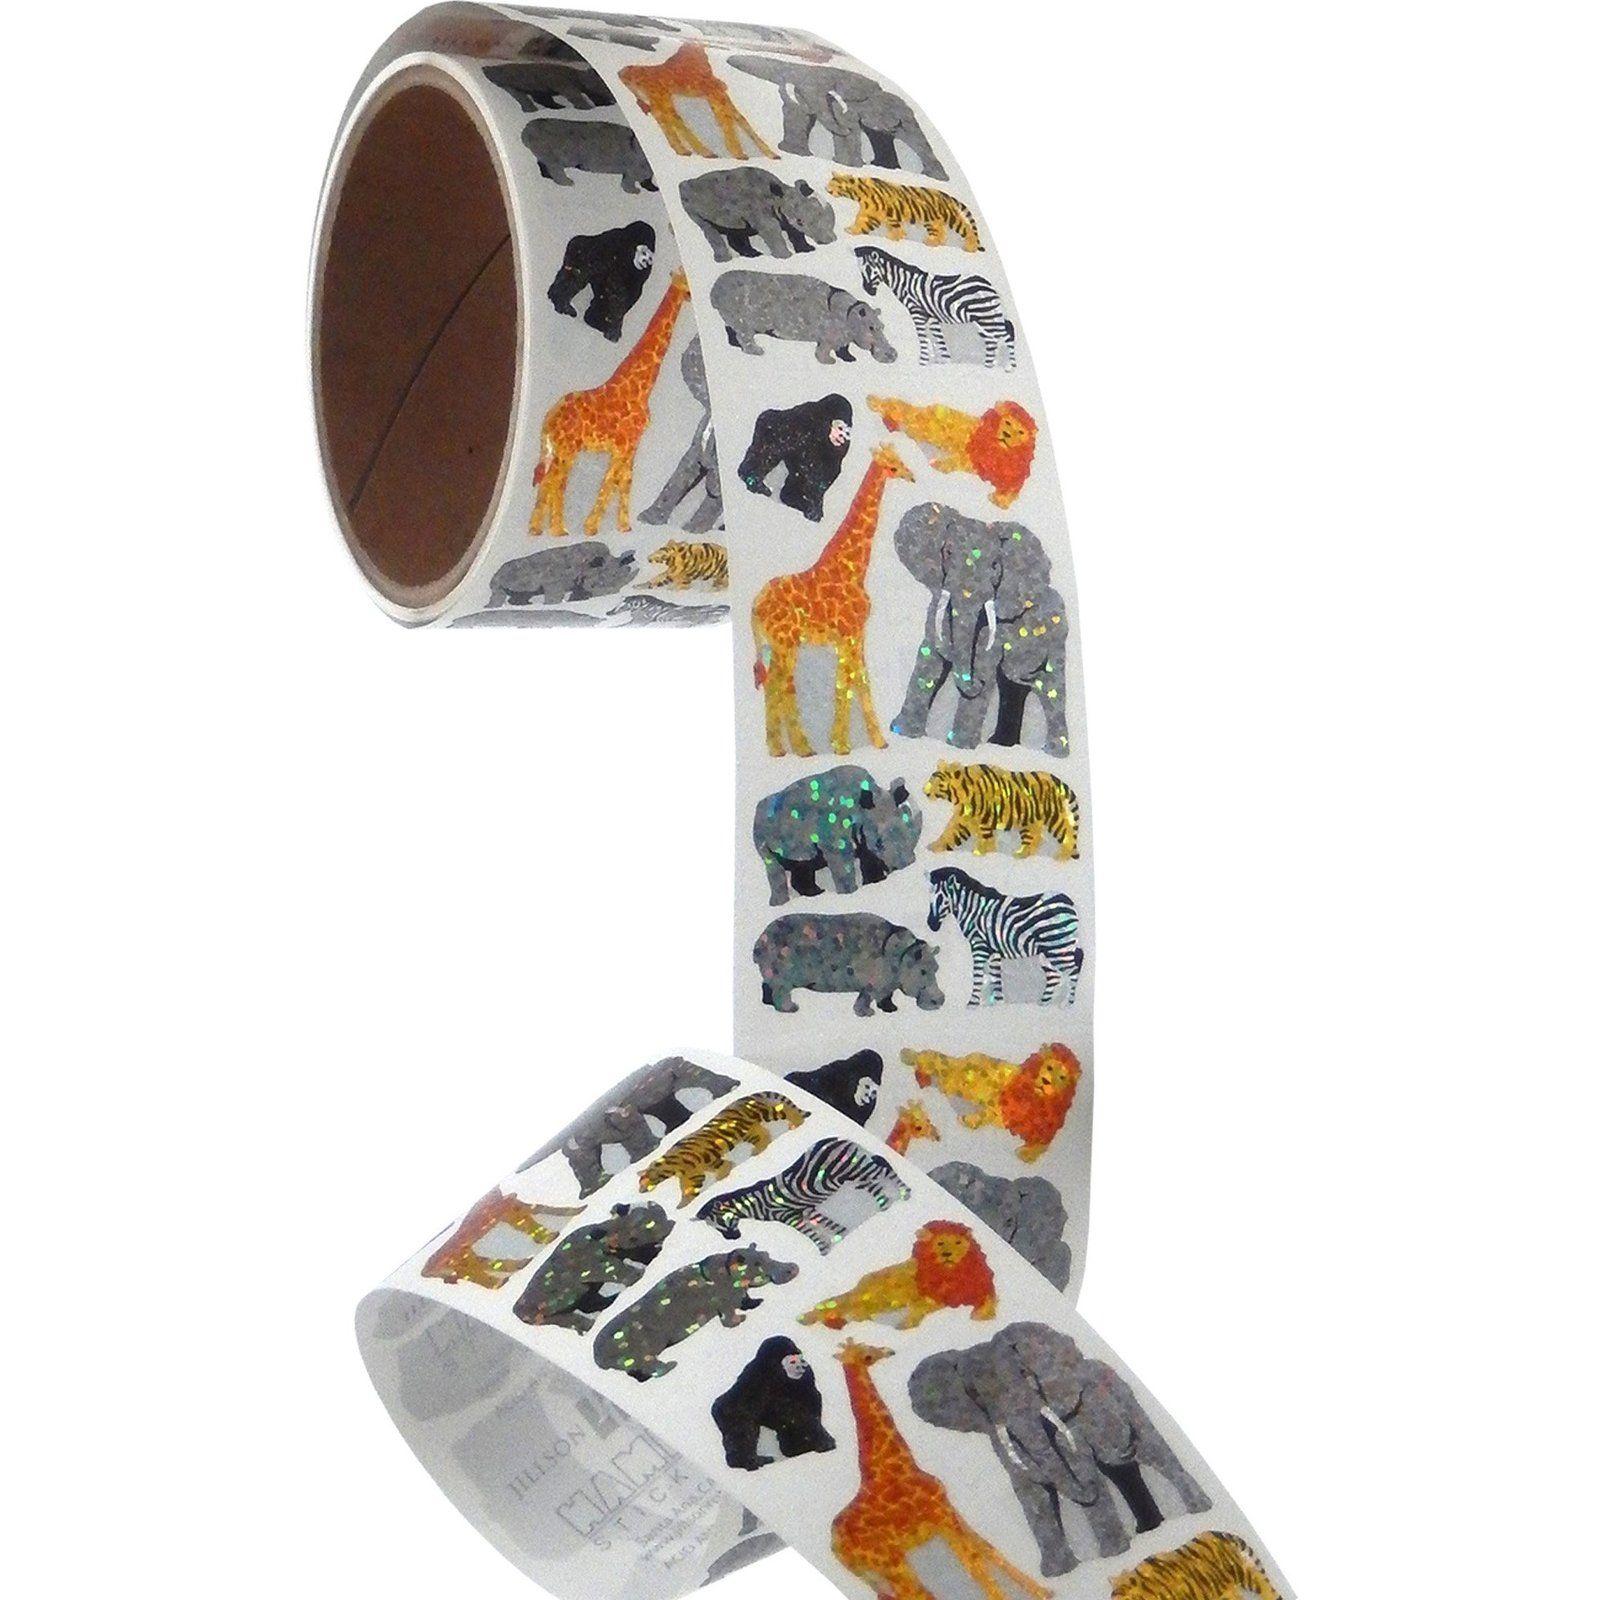 Bulk Roll Prismatic Stickers Happy Birthday Assortment 50 Repeats